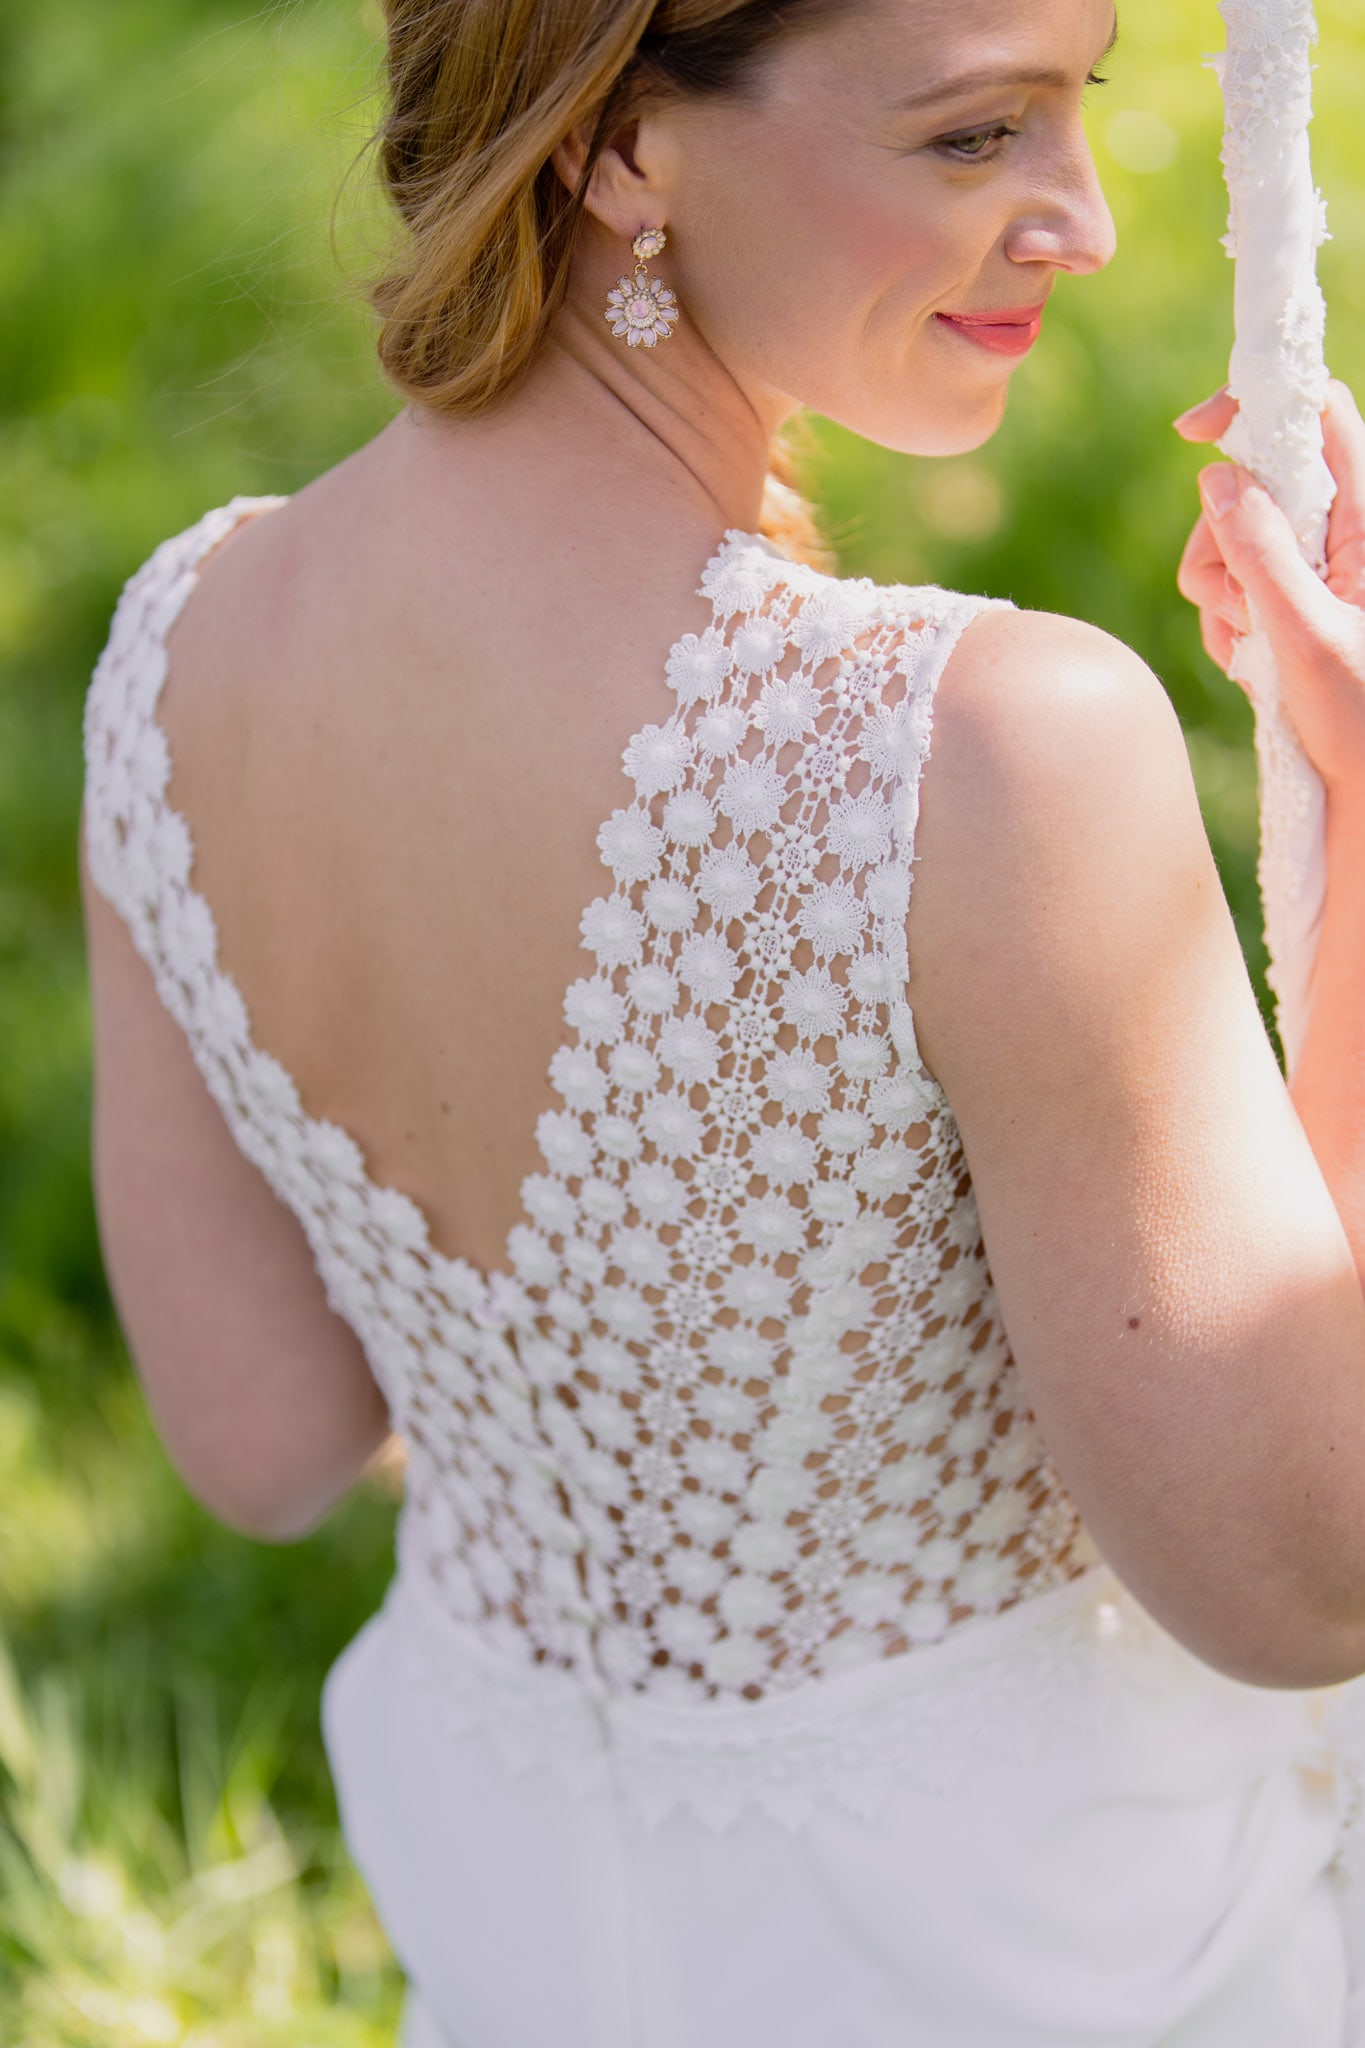 Claudia Heller Modedesign kurzes Brautkleid Daisy 6 min – gesehen bei frauimmer-herrewig.de